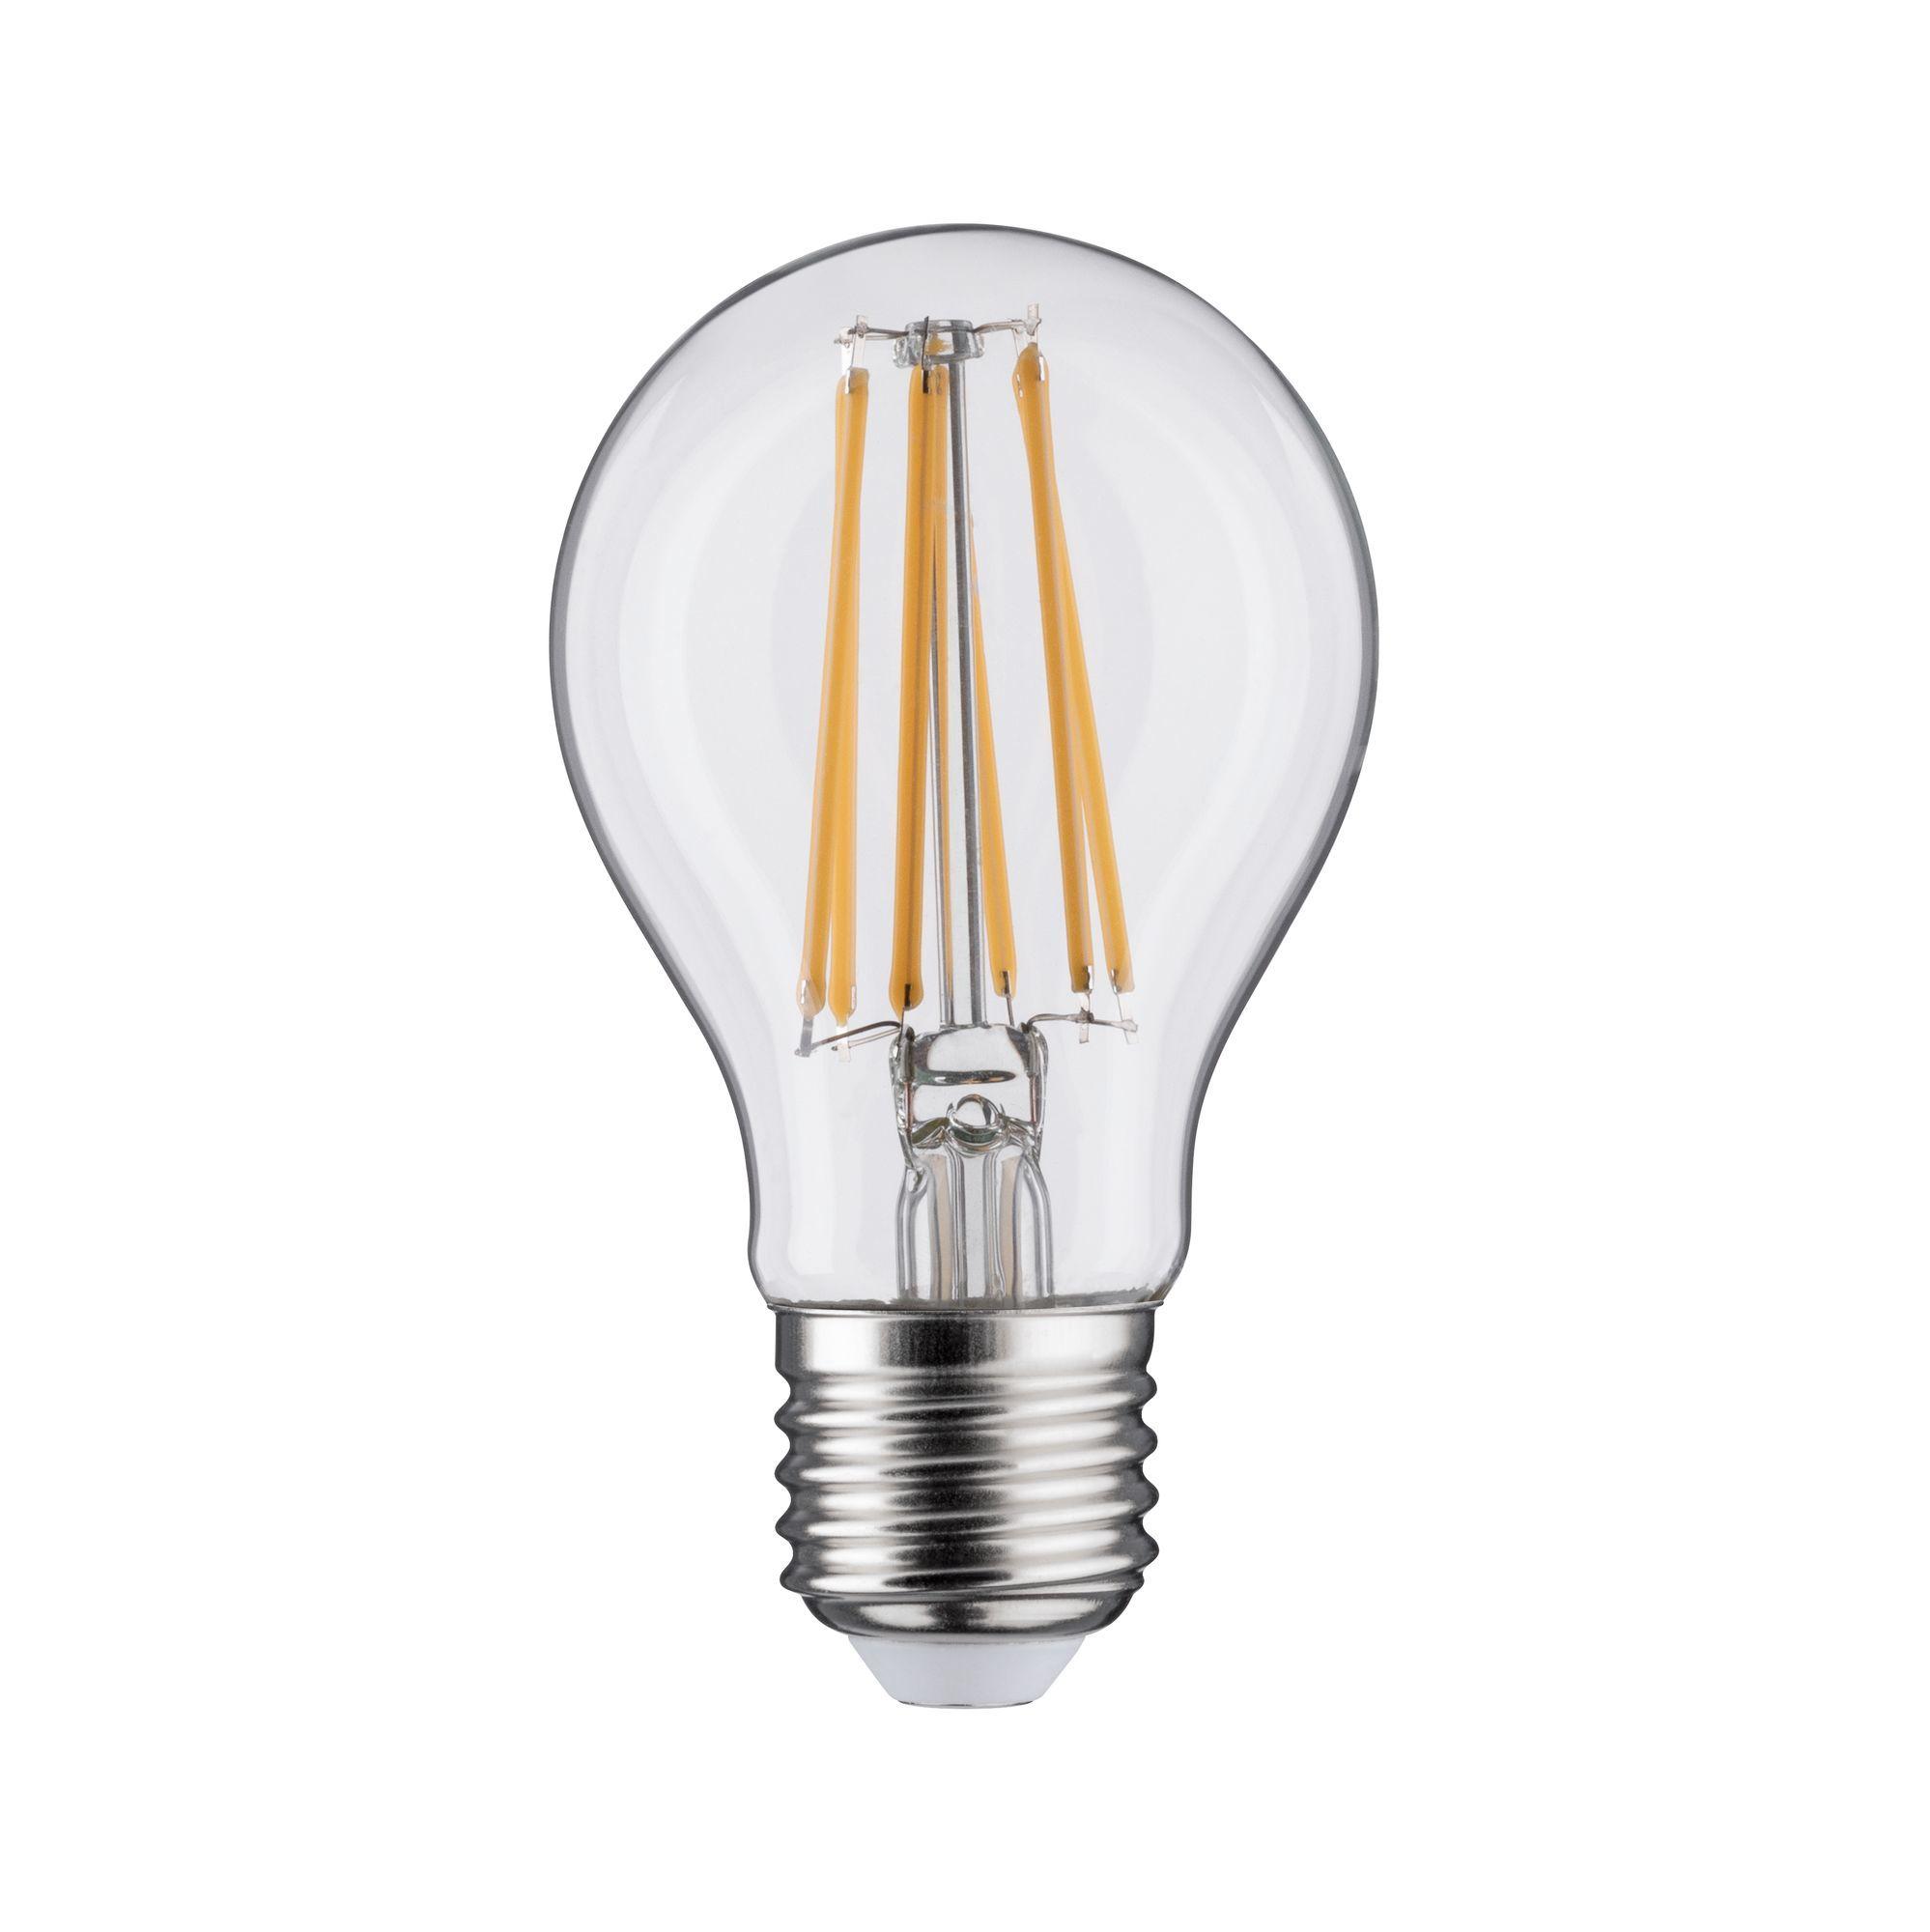 Paulmann LED Fil AGL 1055lm E27 2700K klar 9W 230V (28619)